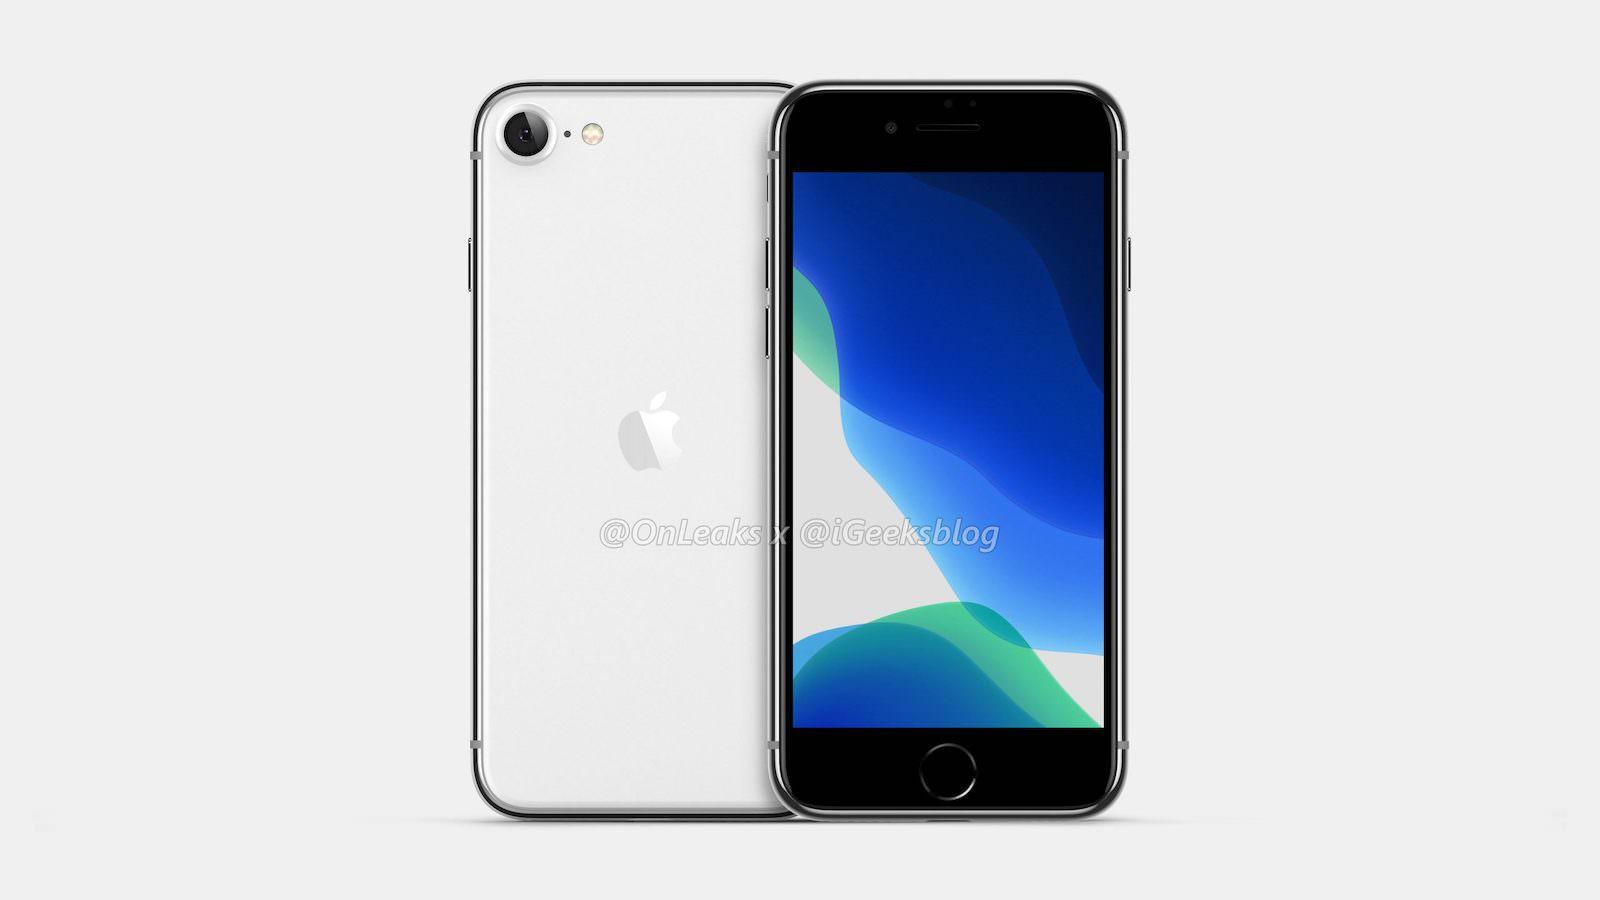 2020-iPhone-SE-2-4.7-LCD-display-scaled.jpg